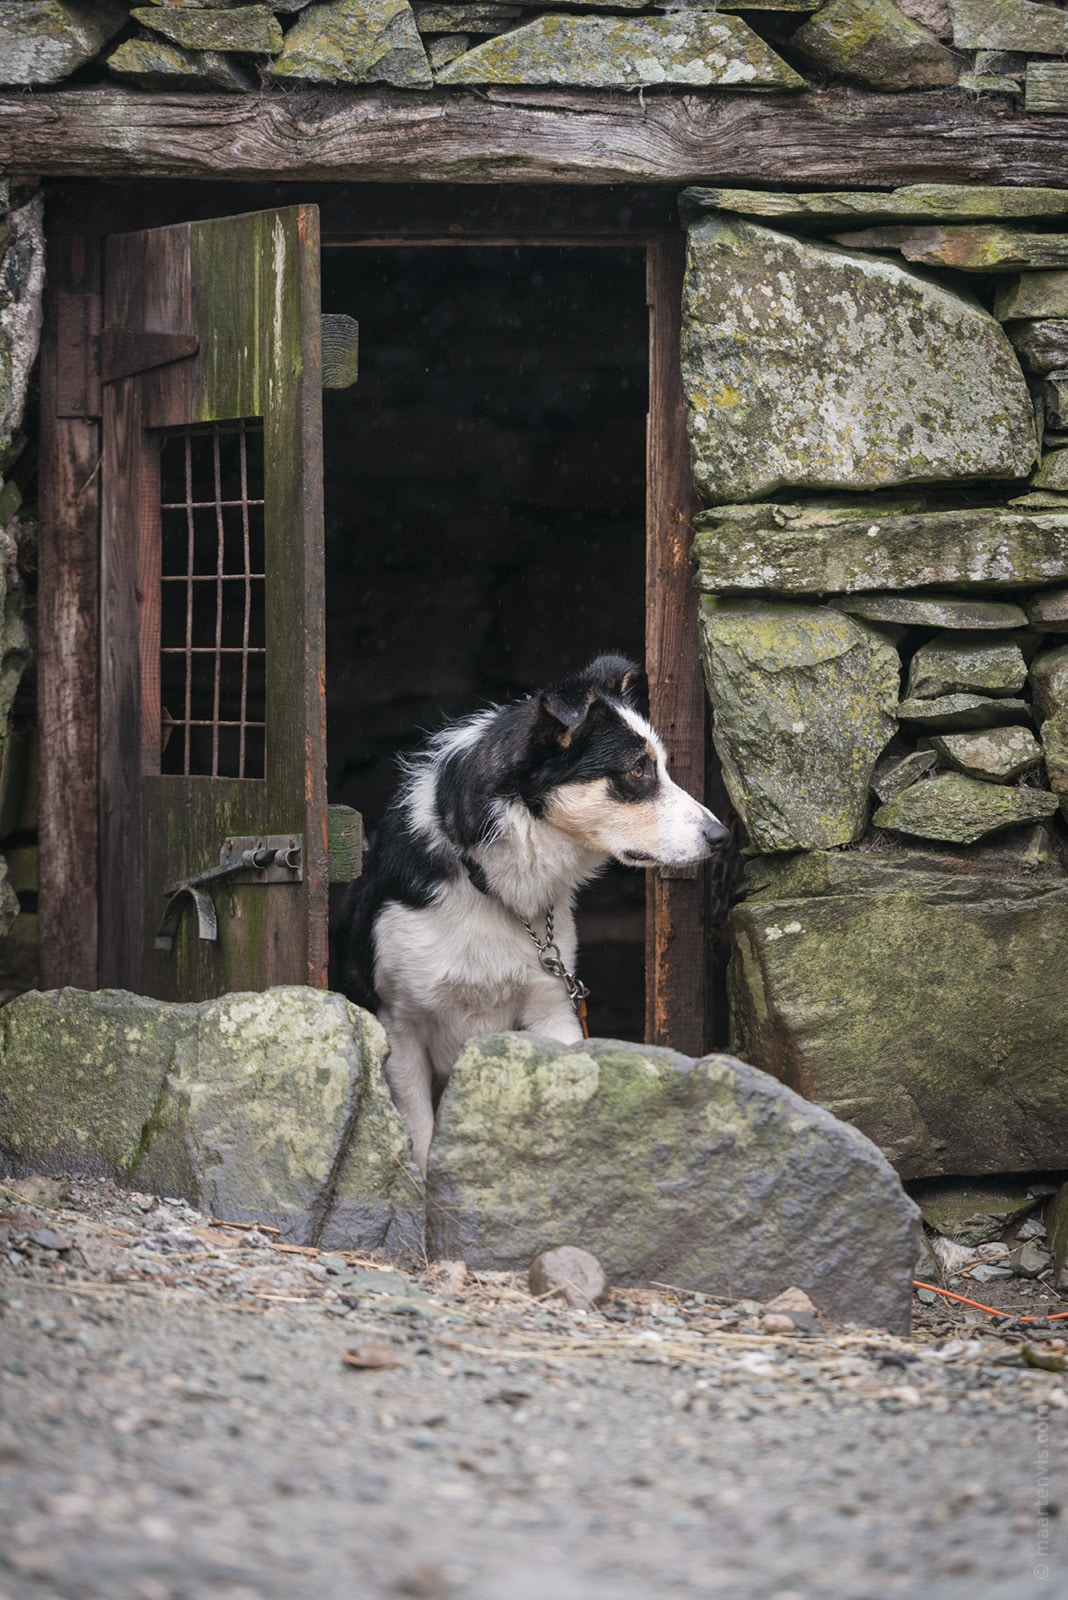 20160326 8524 - Lake District Impressions